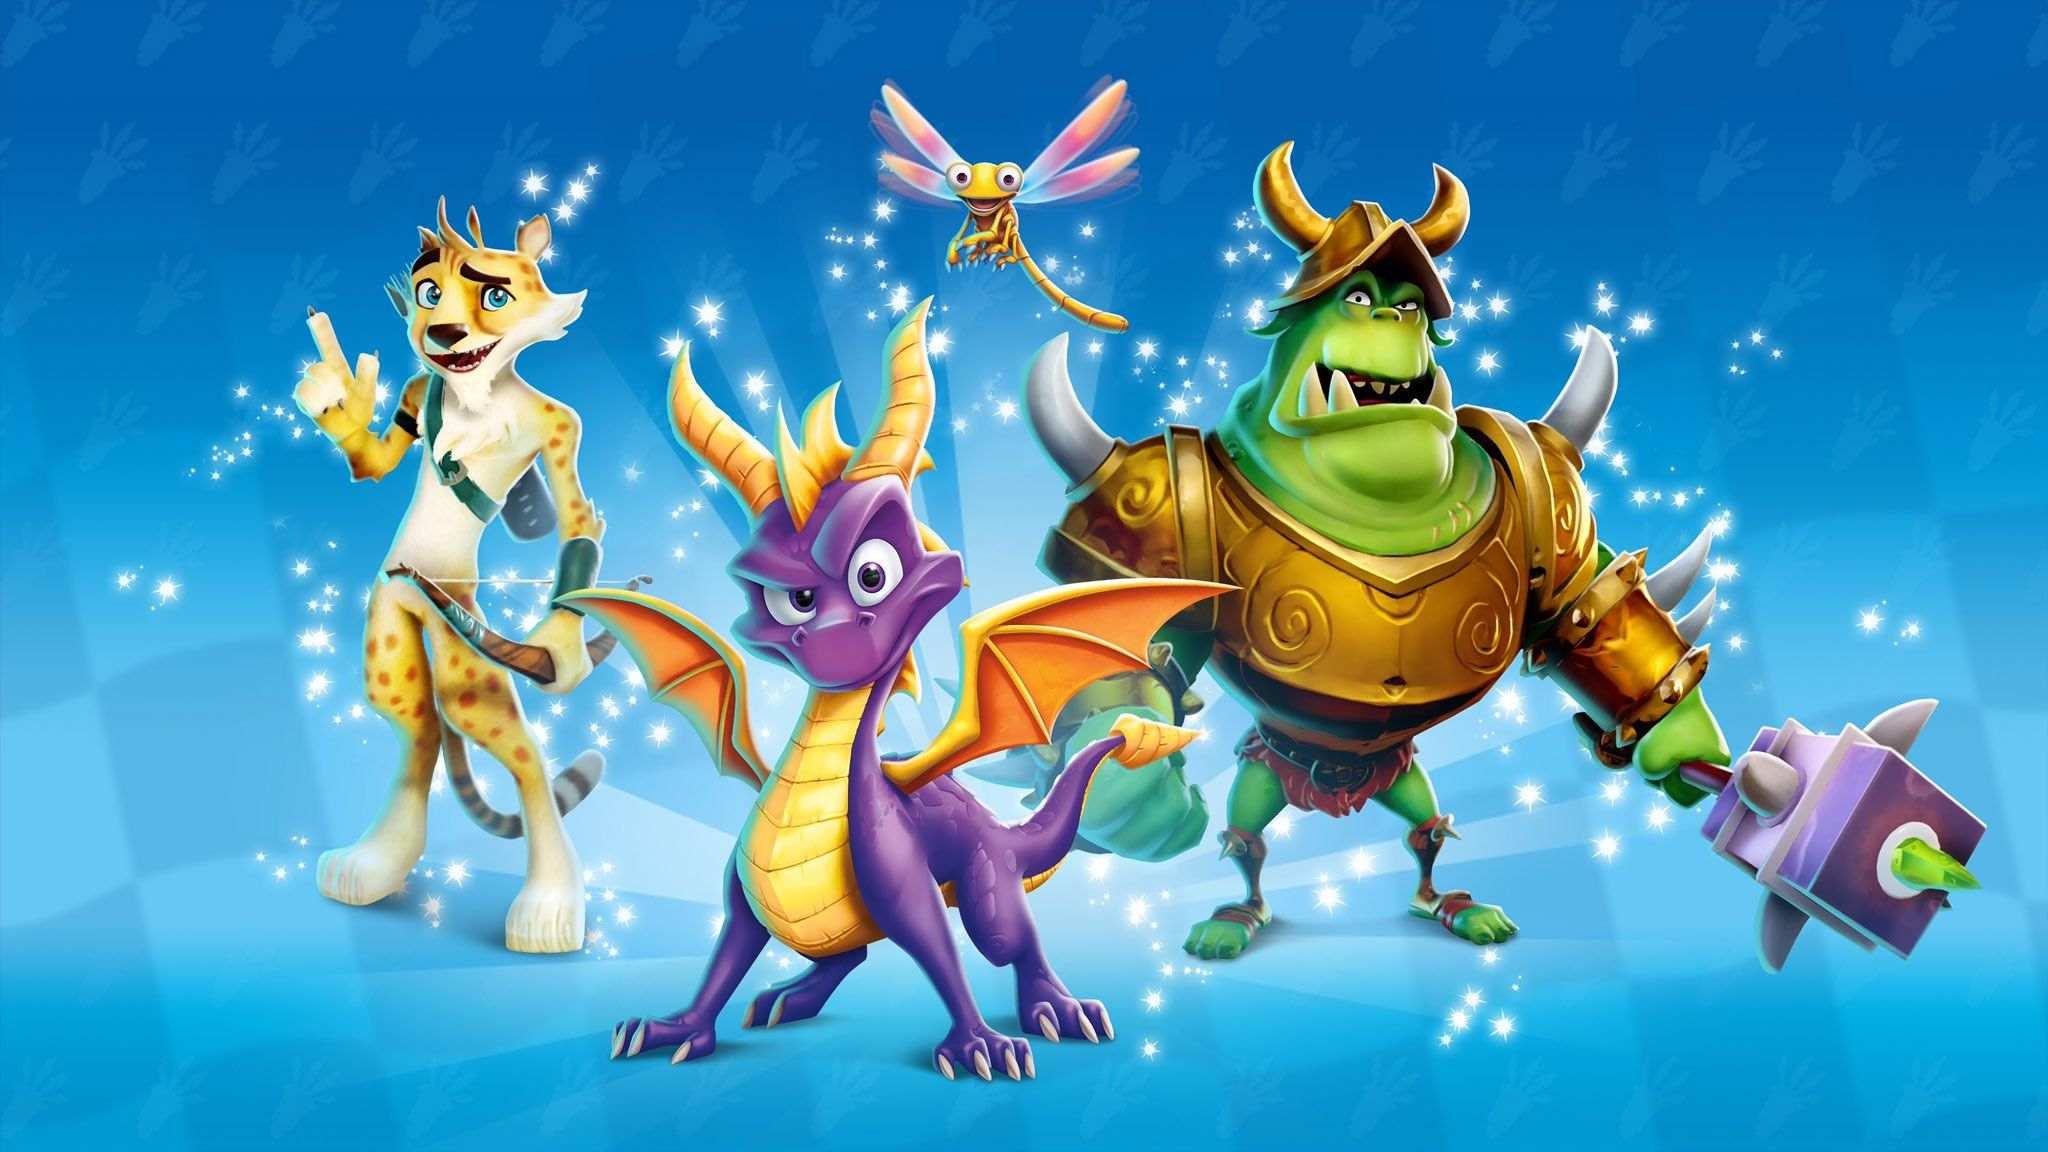 CTR personaggi Spyro